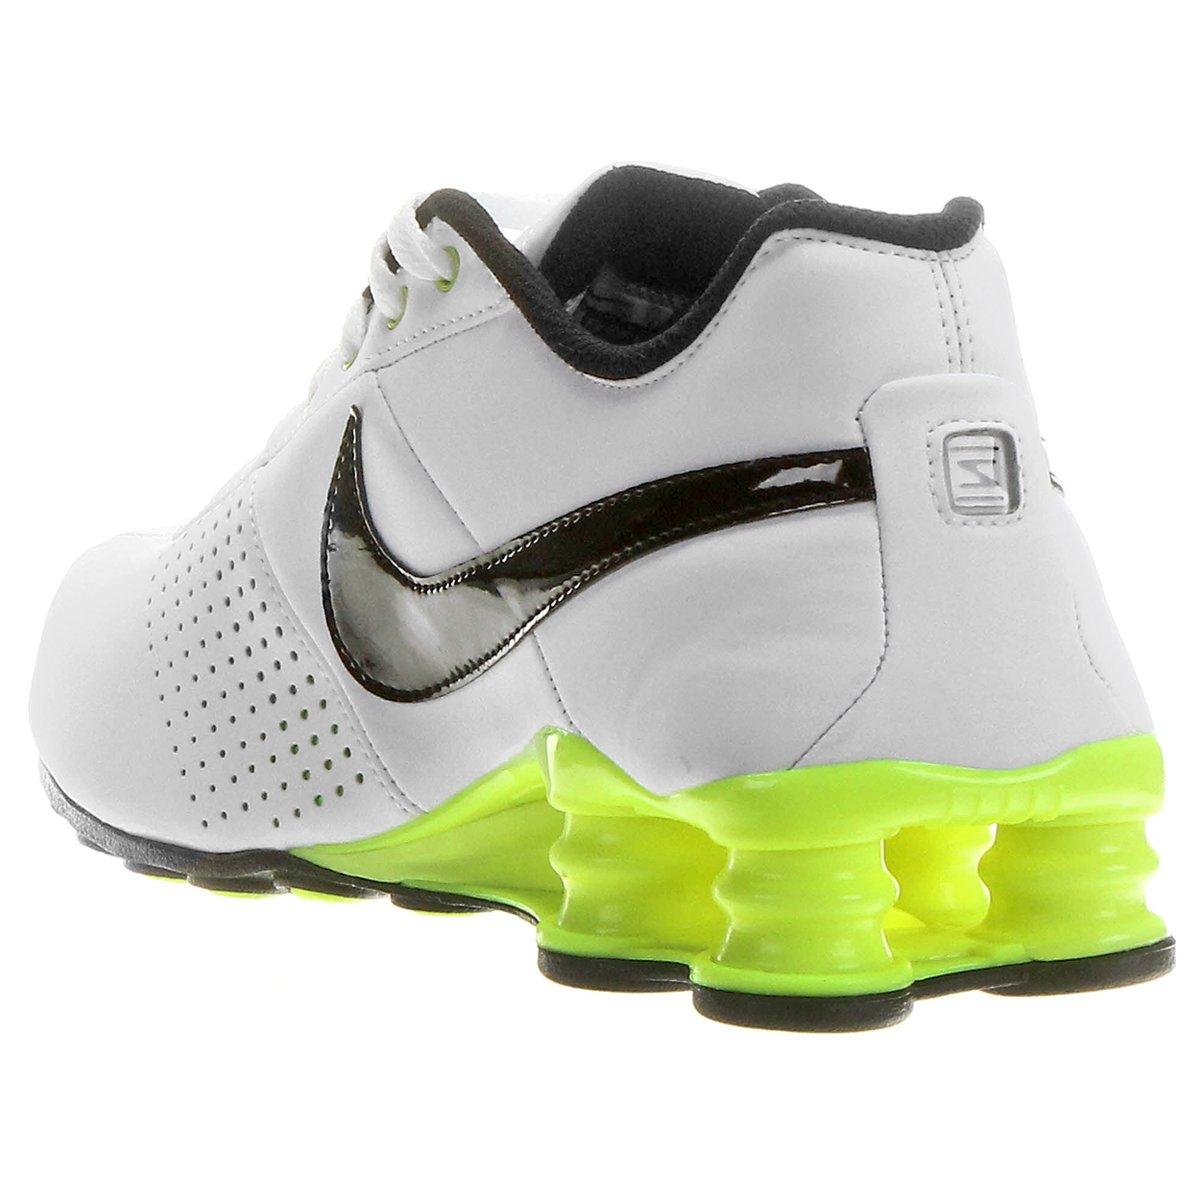 7c2630991ba1 promo code for tenis nike shox deliver verde b604c d8679